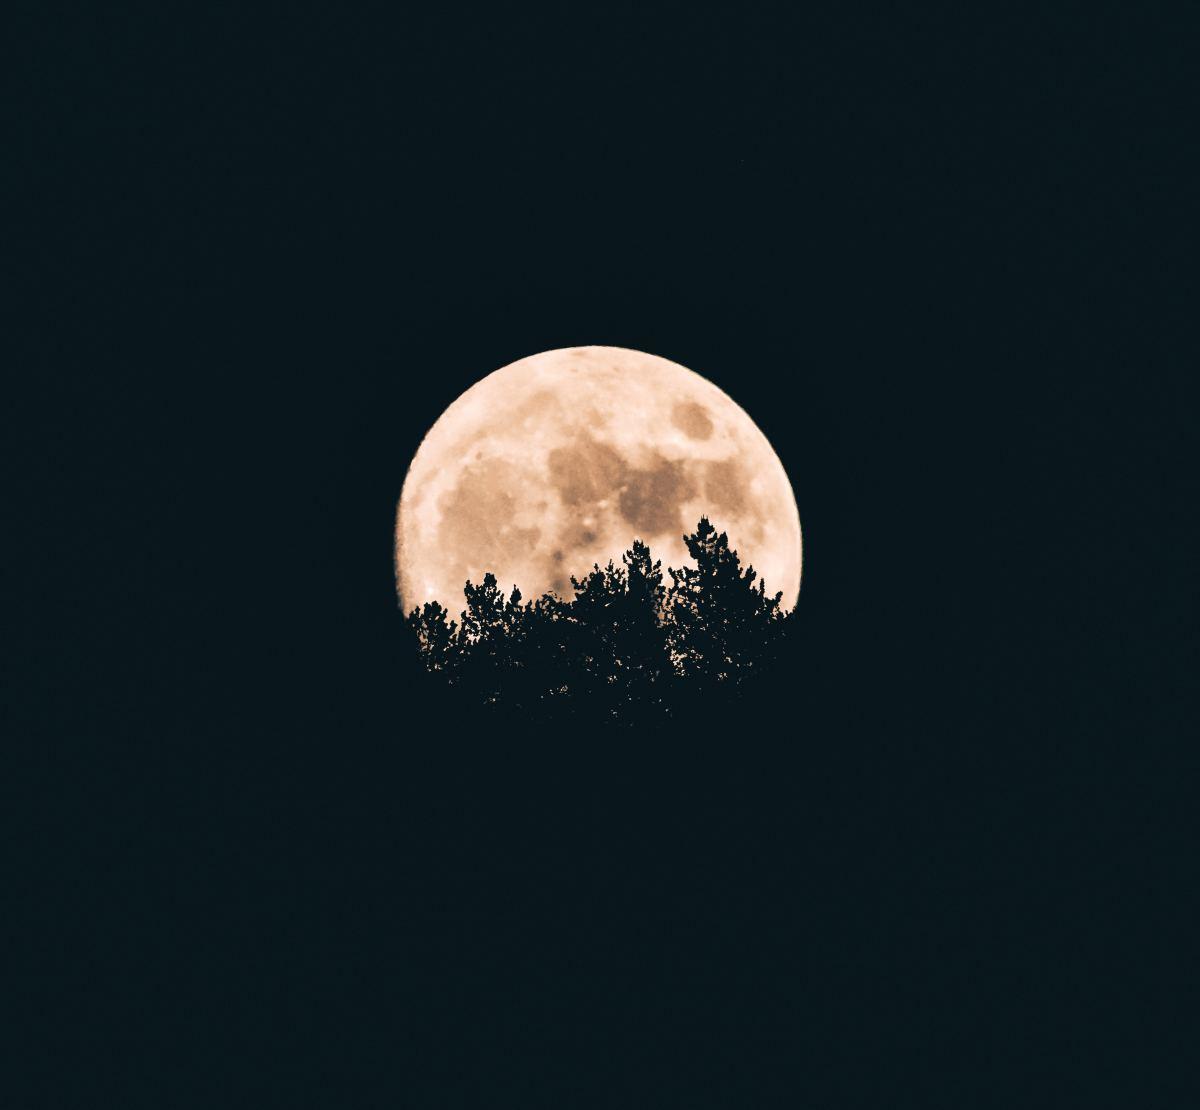 Shy moon hiding behind the trees!